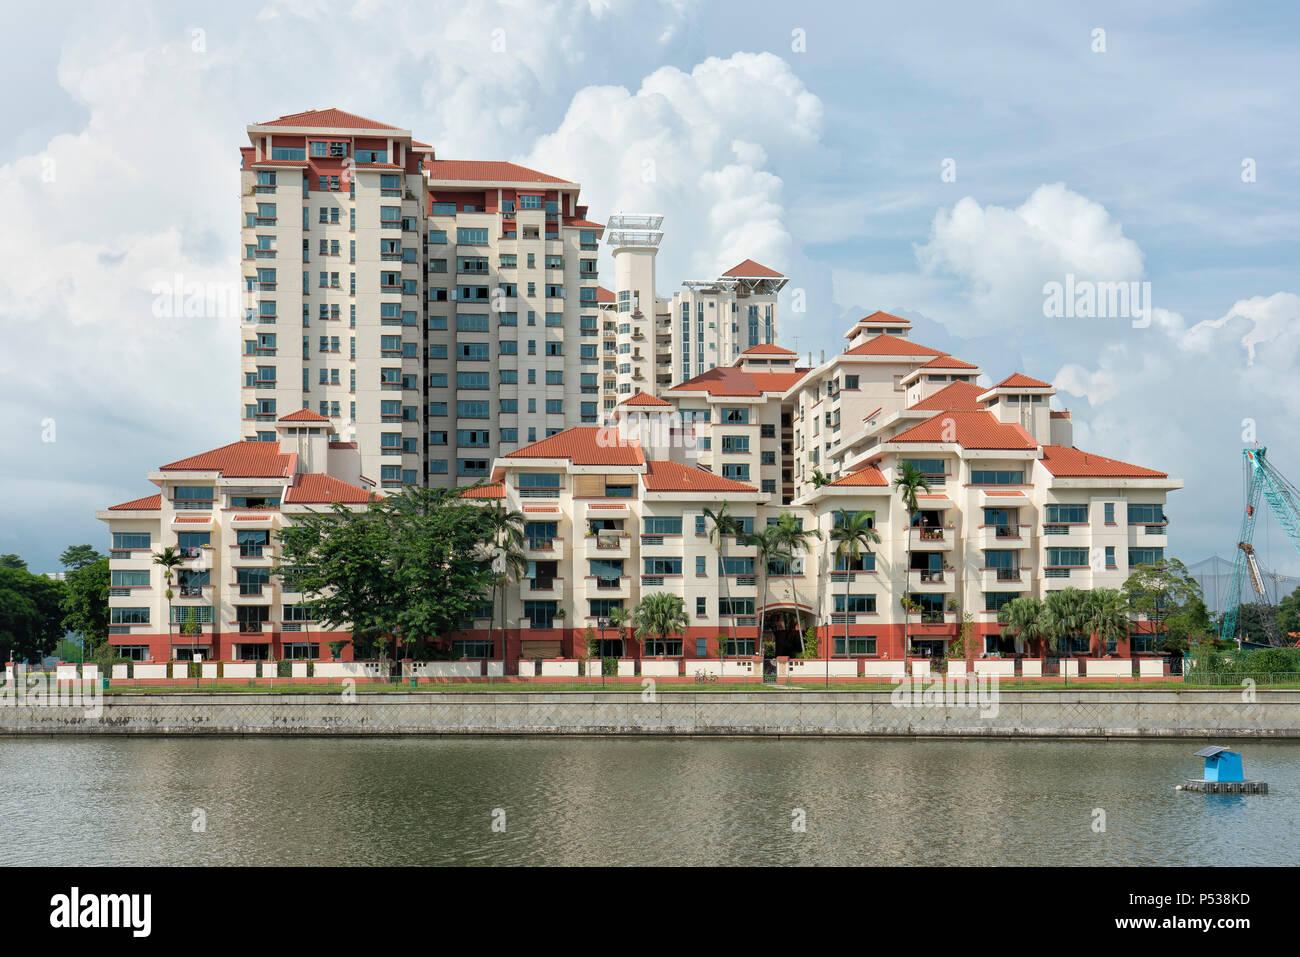 Casuarina Cove Condominium, a  property located at Tanjong Rhu Road - Stock Image